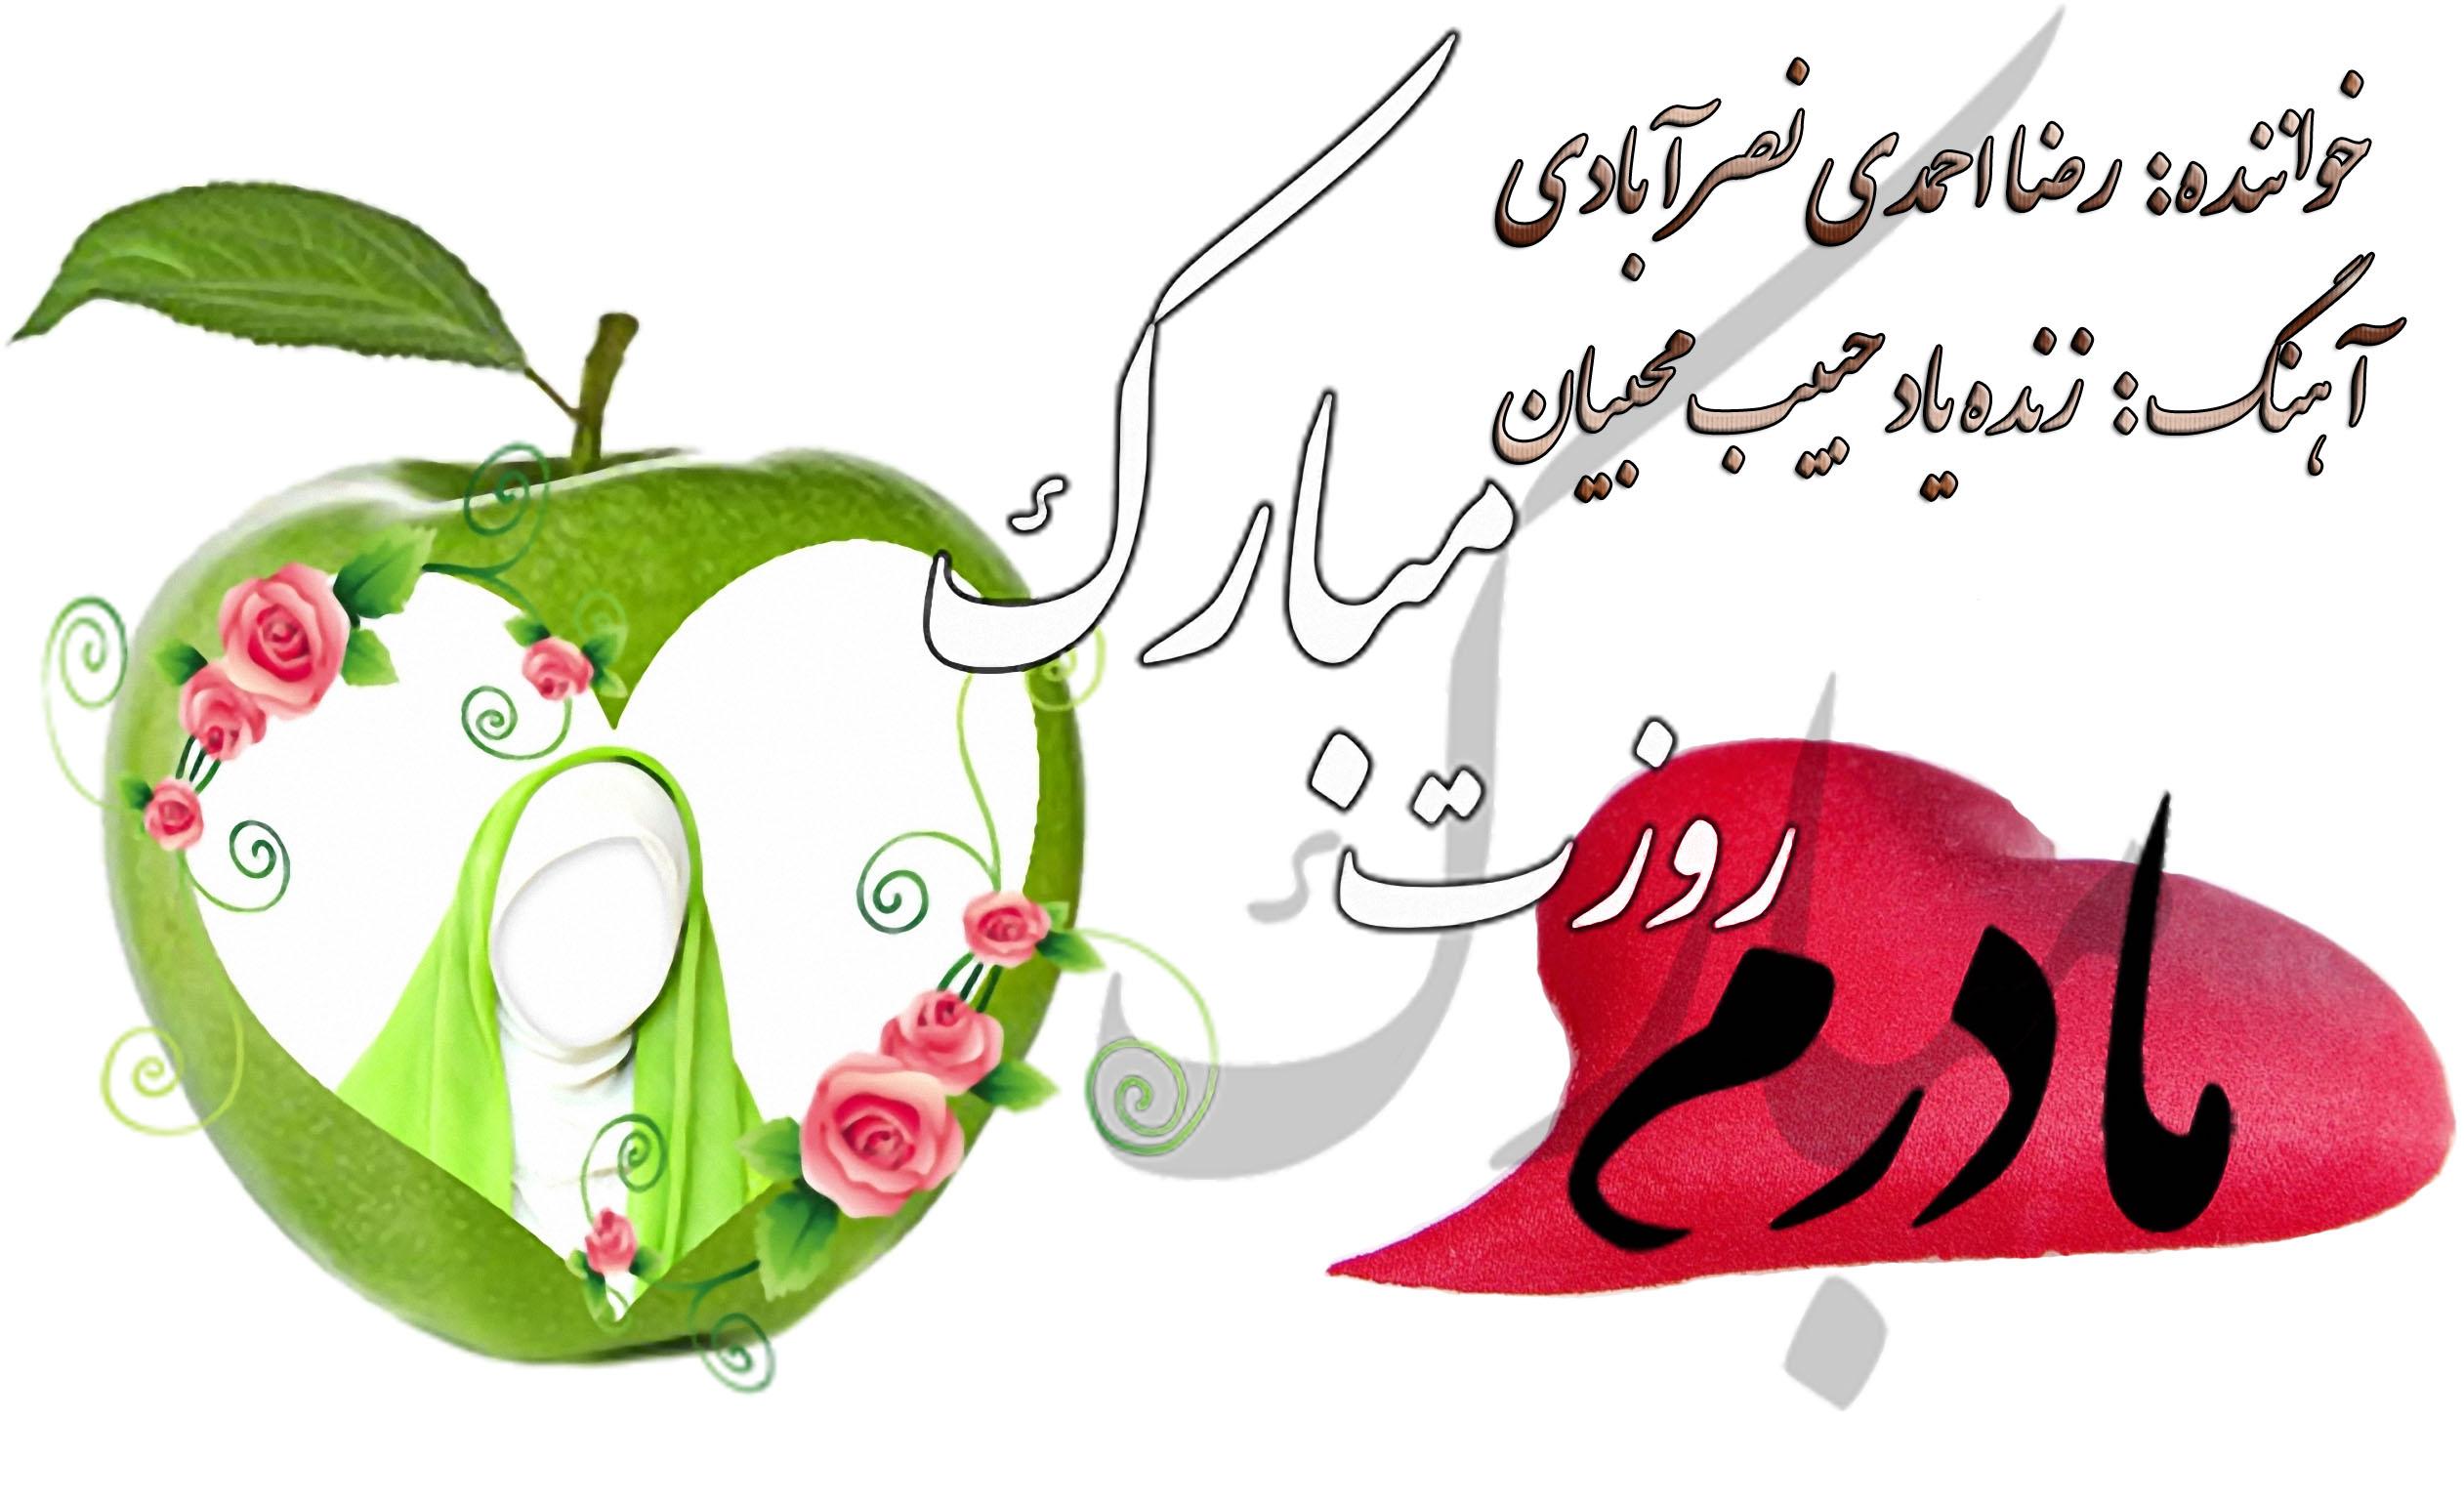 Reza_Ahmadi_Nasrabadi_Madaram_Roozat_Mobarak_.jpg